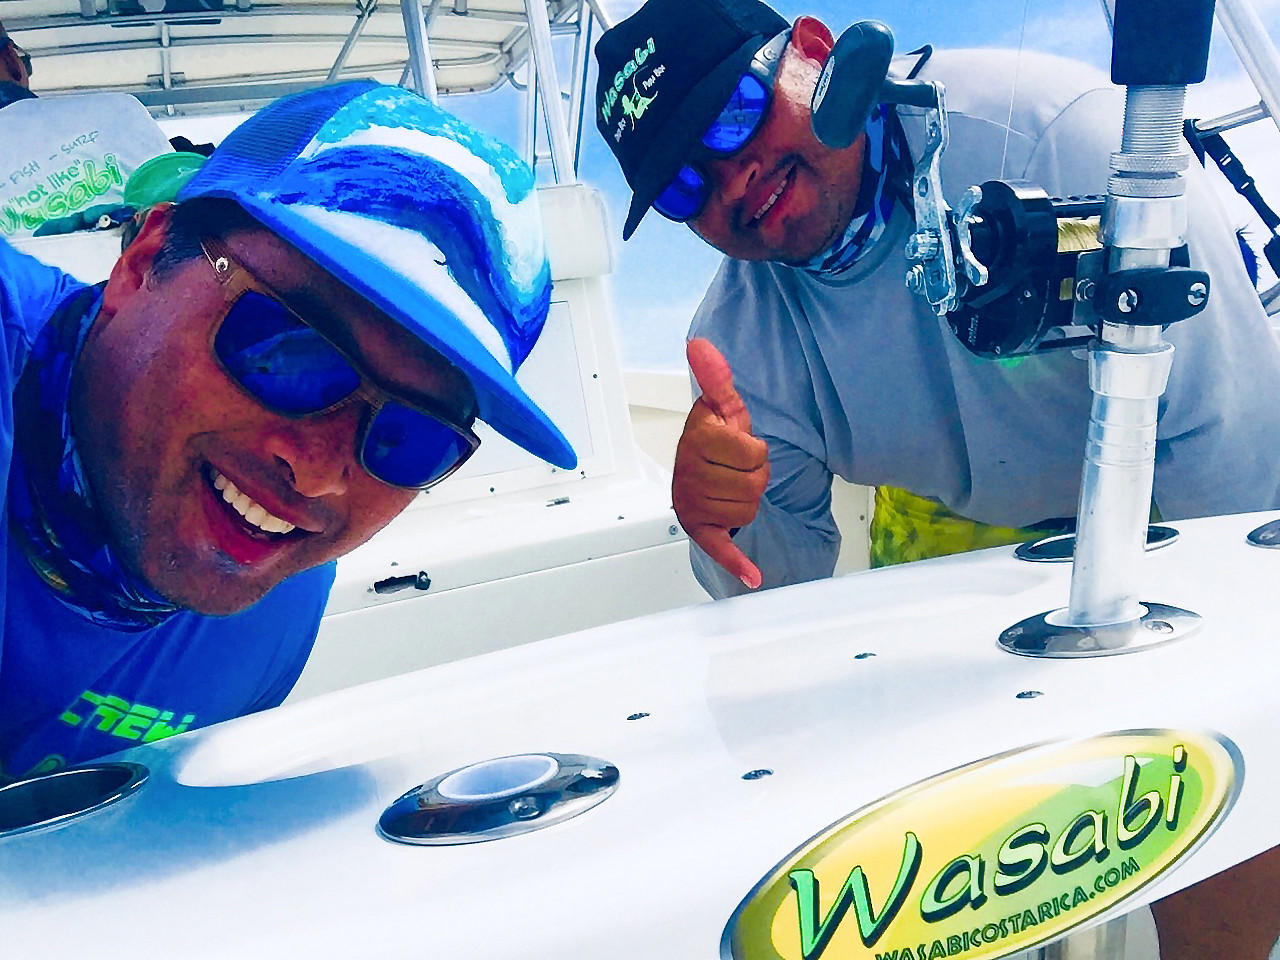 Wasabi Fishing - The Team